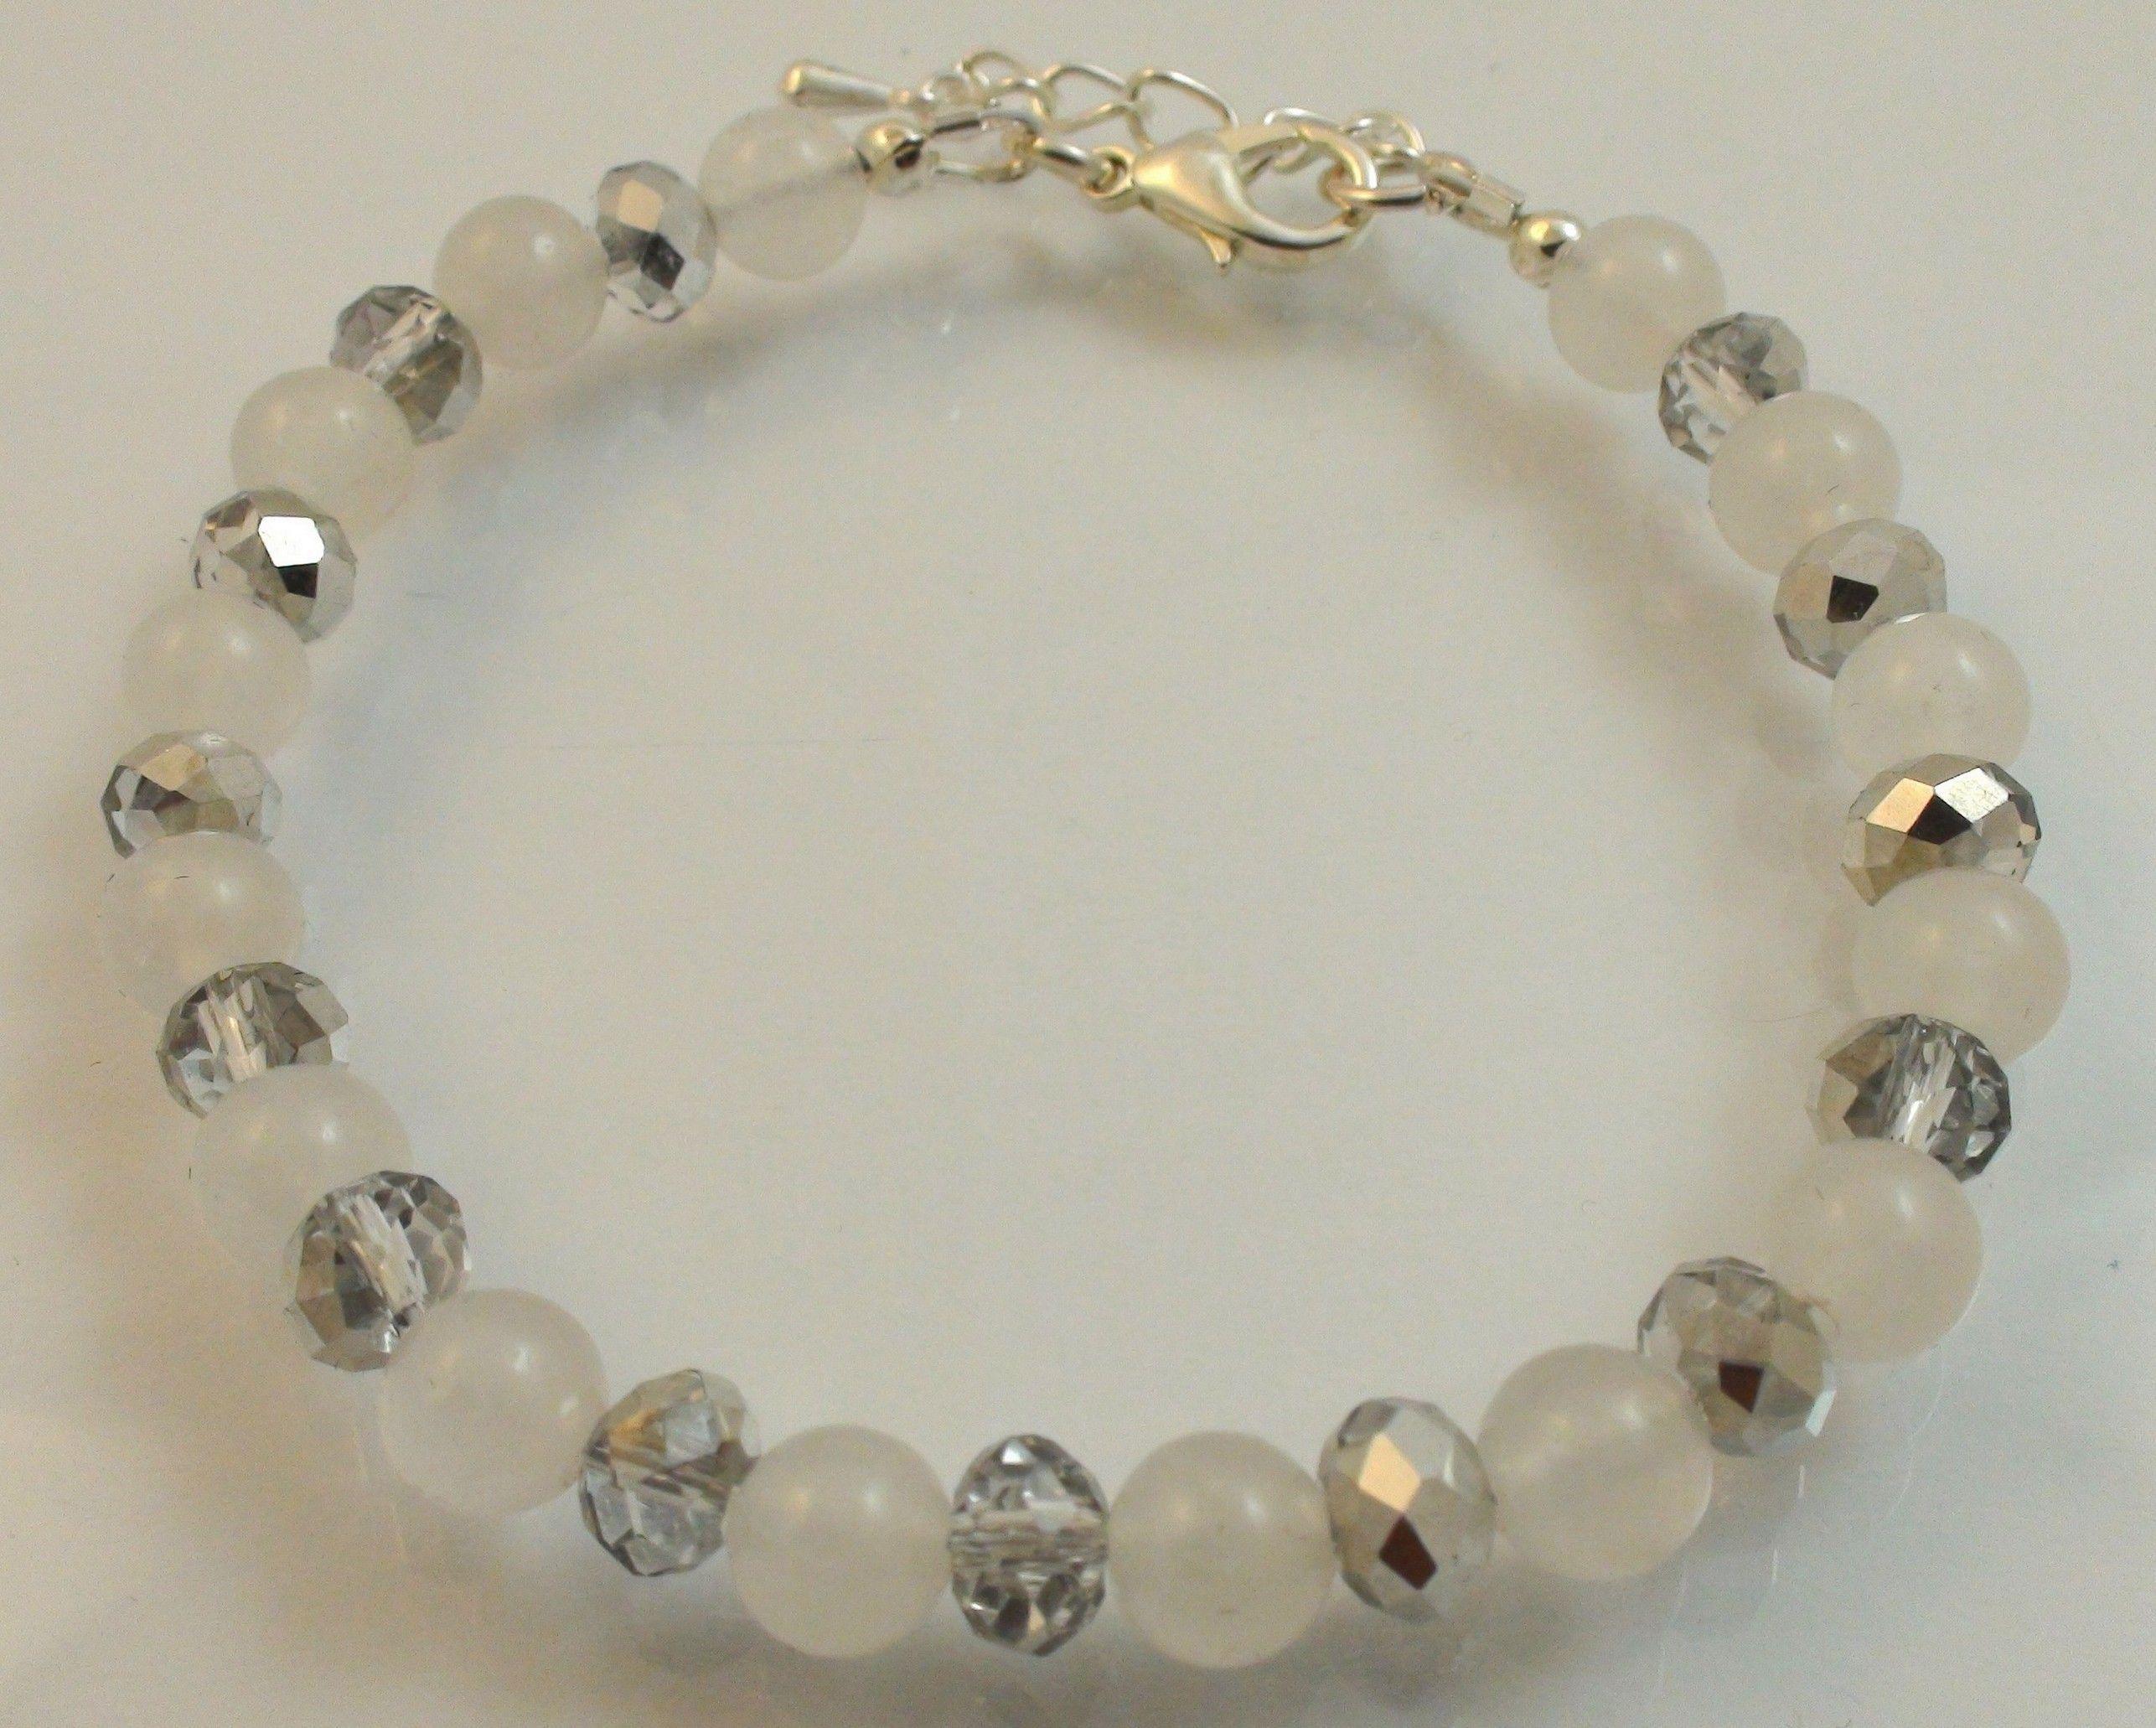 White Jade Bracelet Elegant white jade bracelet with silvery Austrian crystal spacer beads.